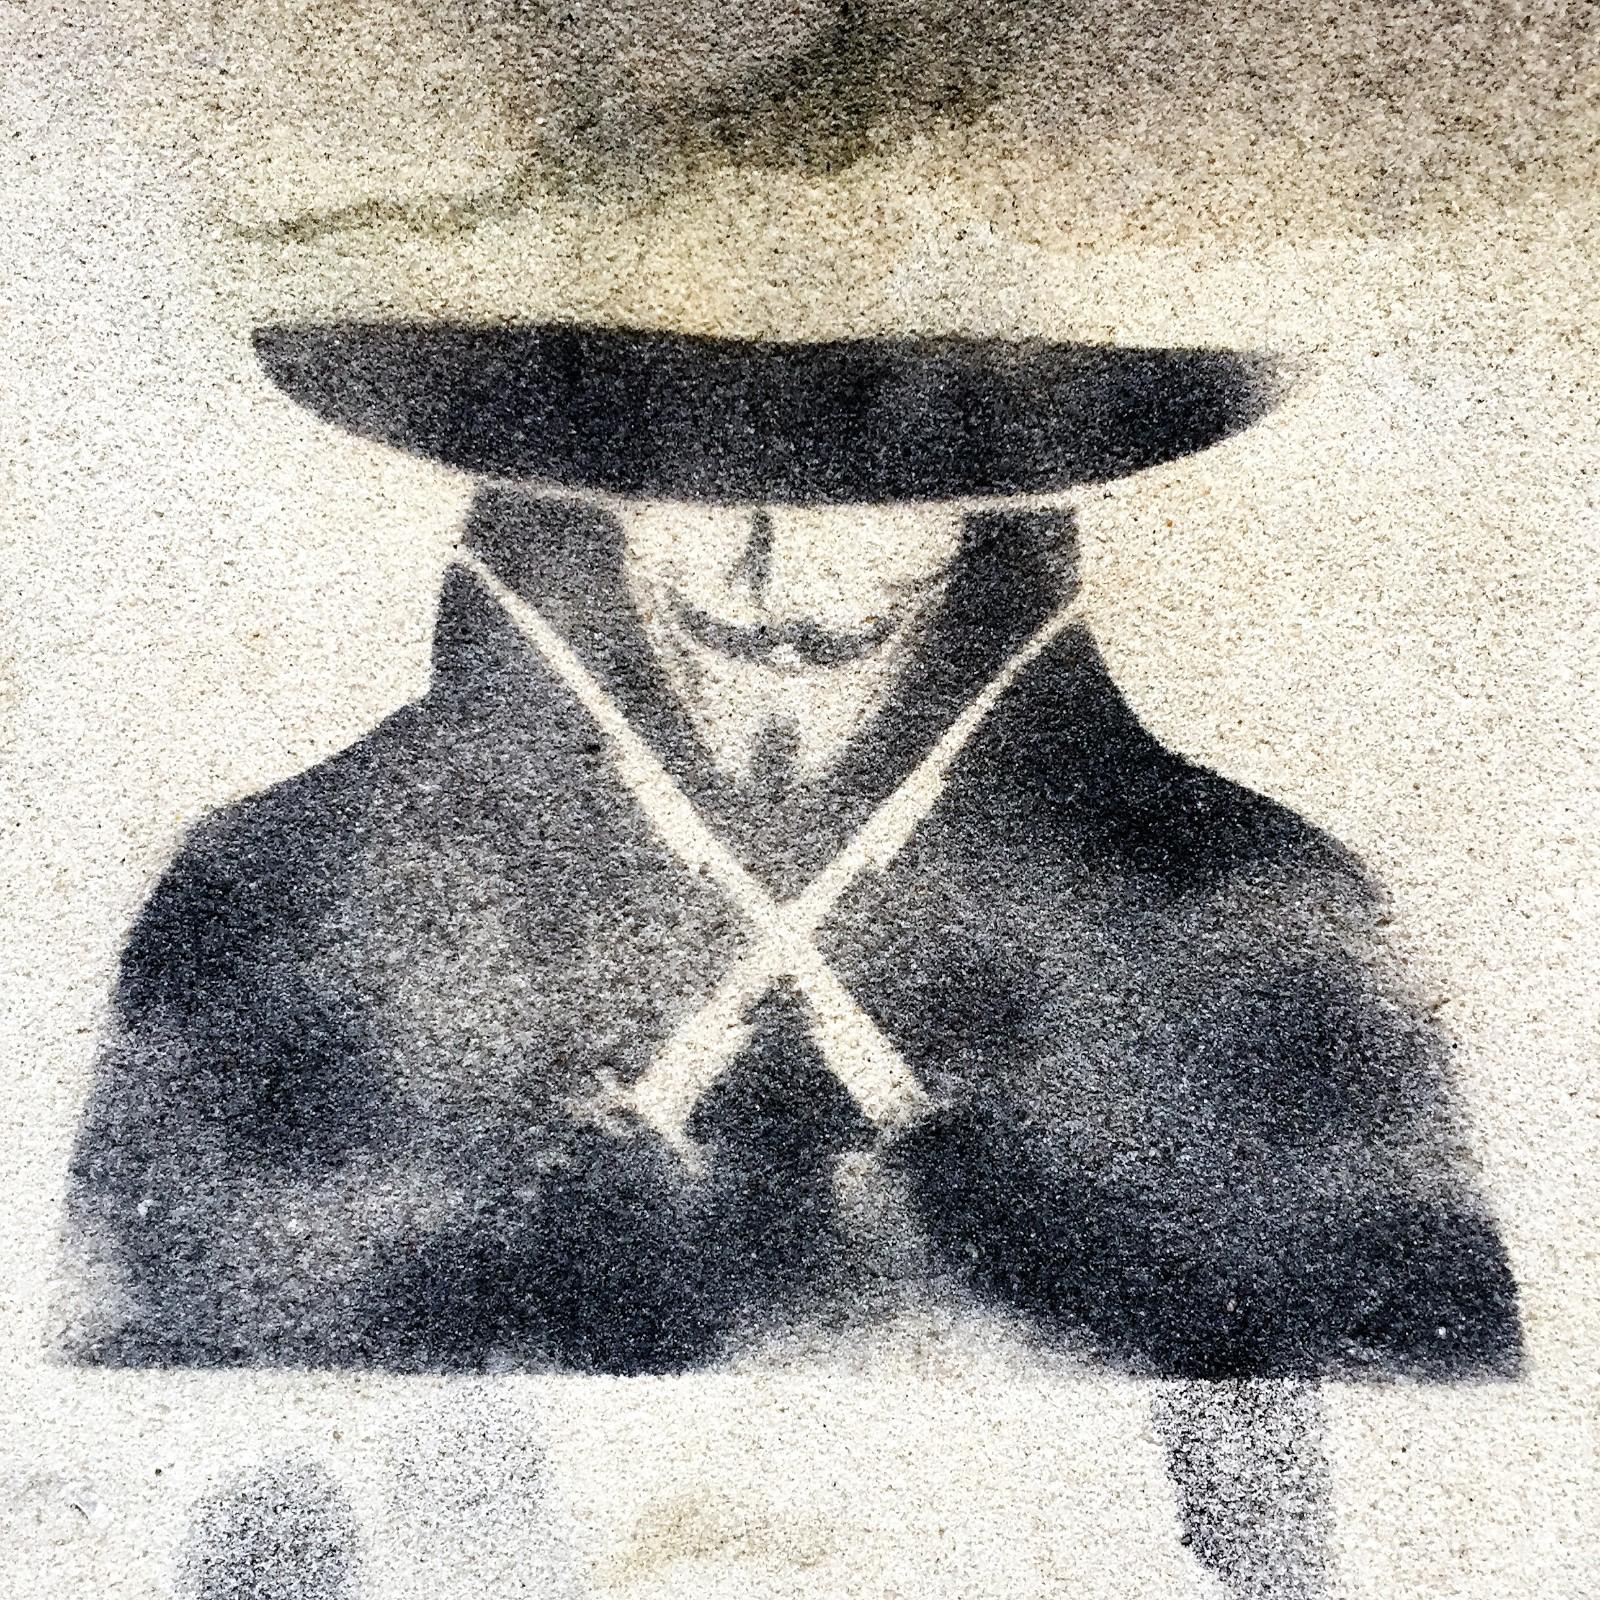 Paris_Street Art Stencil Anonymous